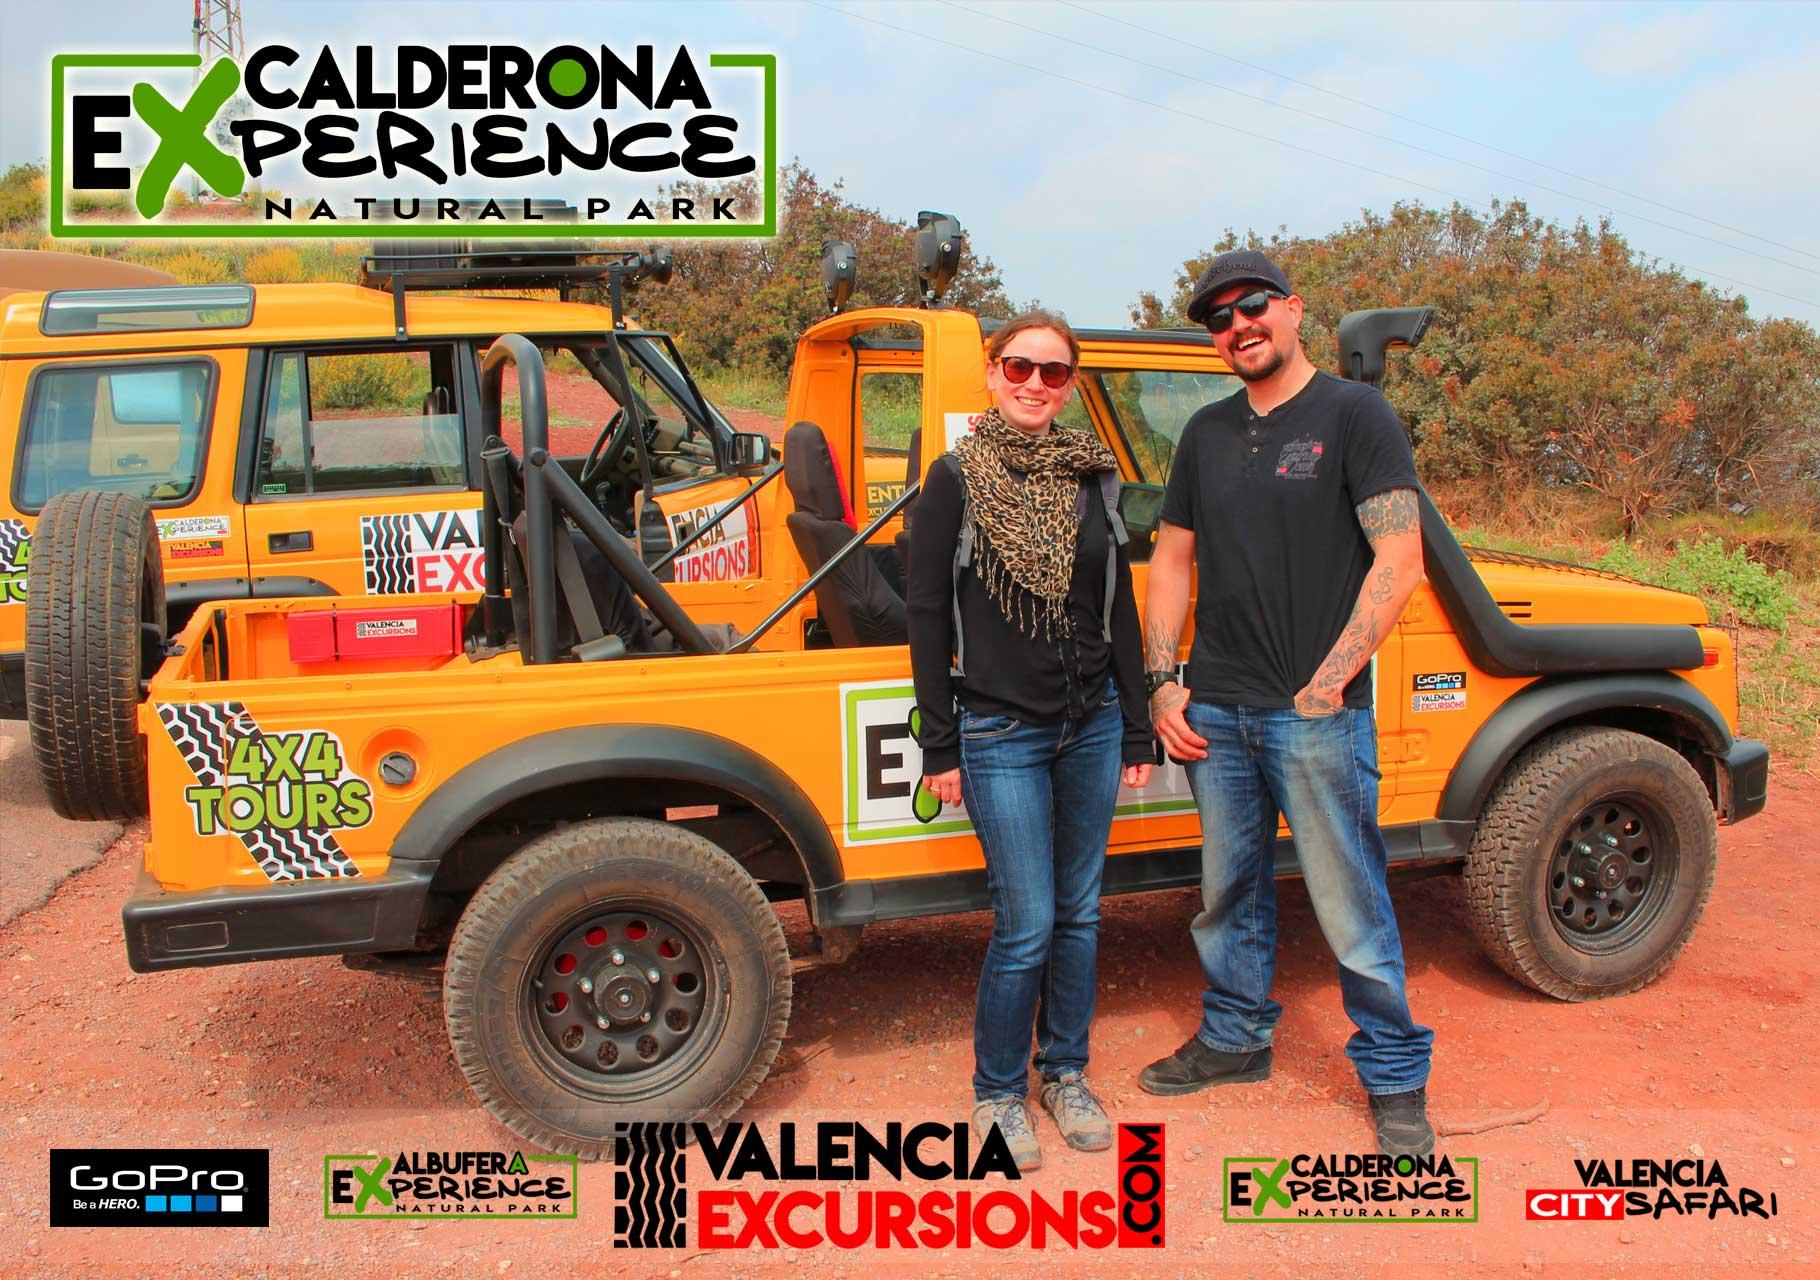 rutas 4x4 en Valencia offroad tours in Valencia